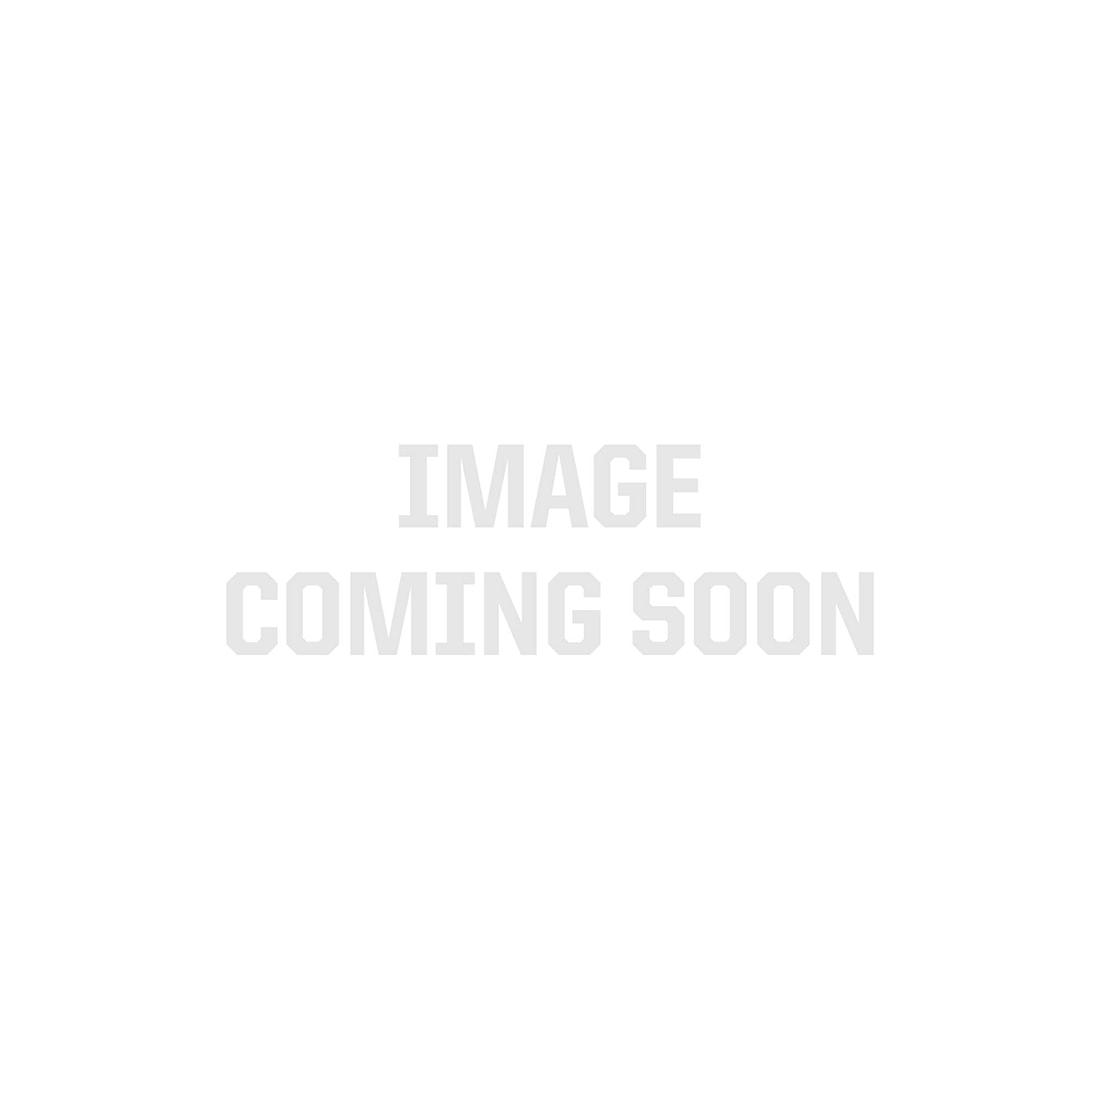 Daylight White 3528 Quad Row LED Strip Light, 450/m, 28mm wide, Sample Kit